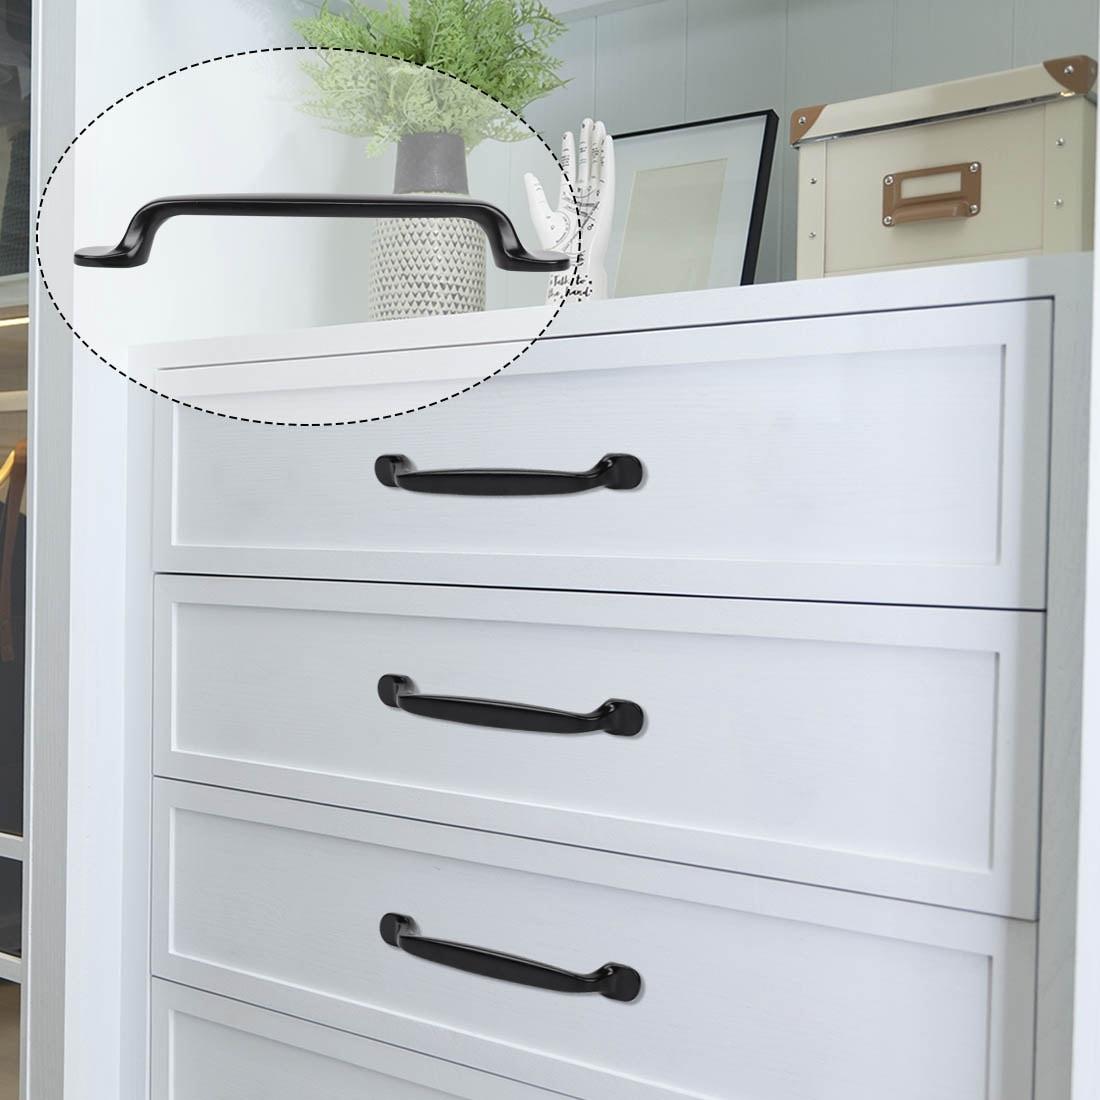 Cabinet Handles Drawer Pulls 5